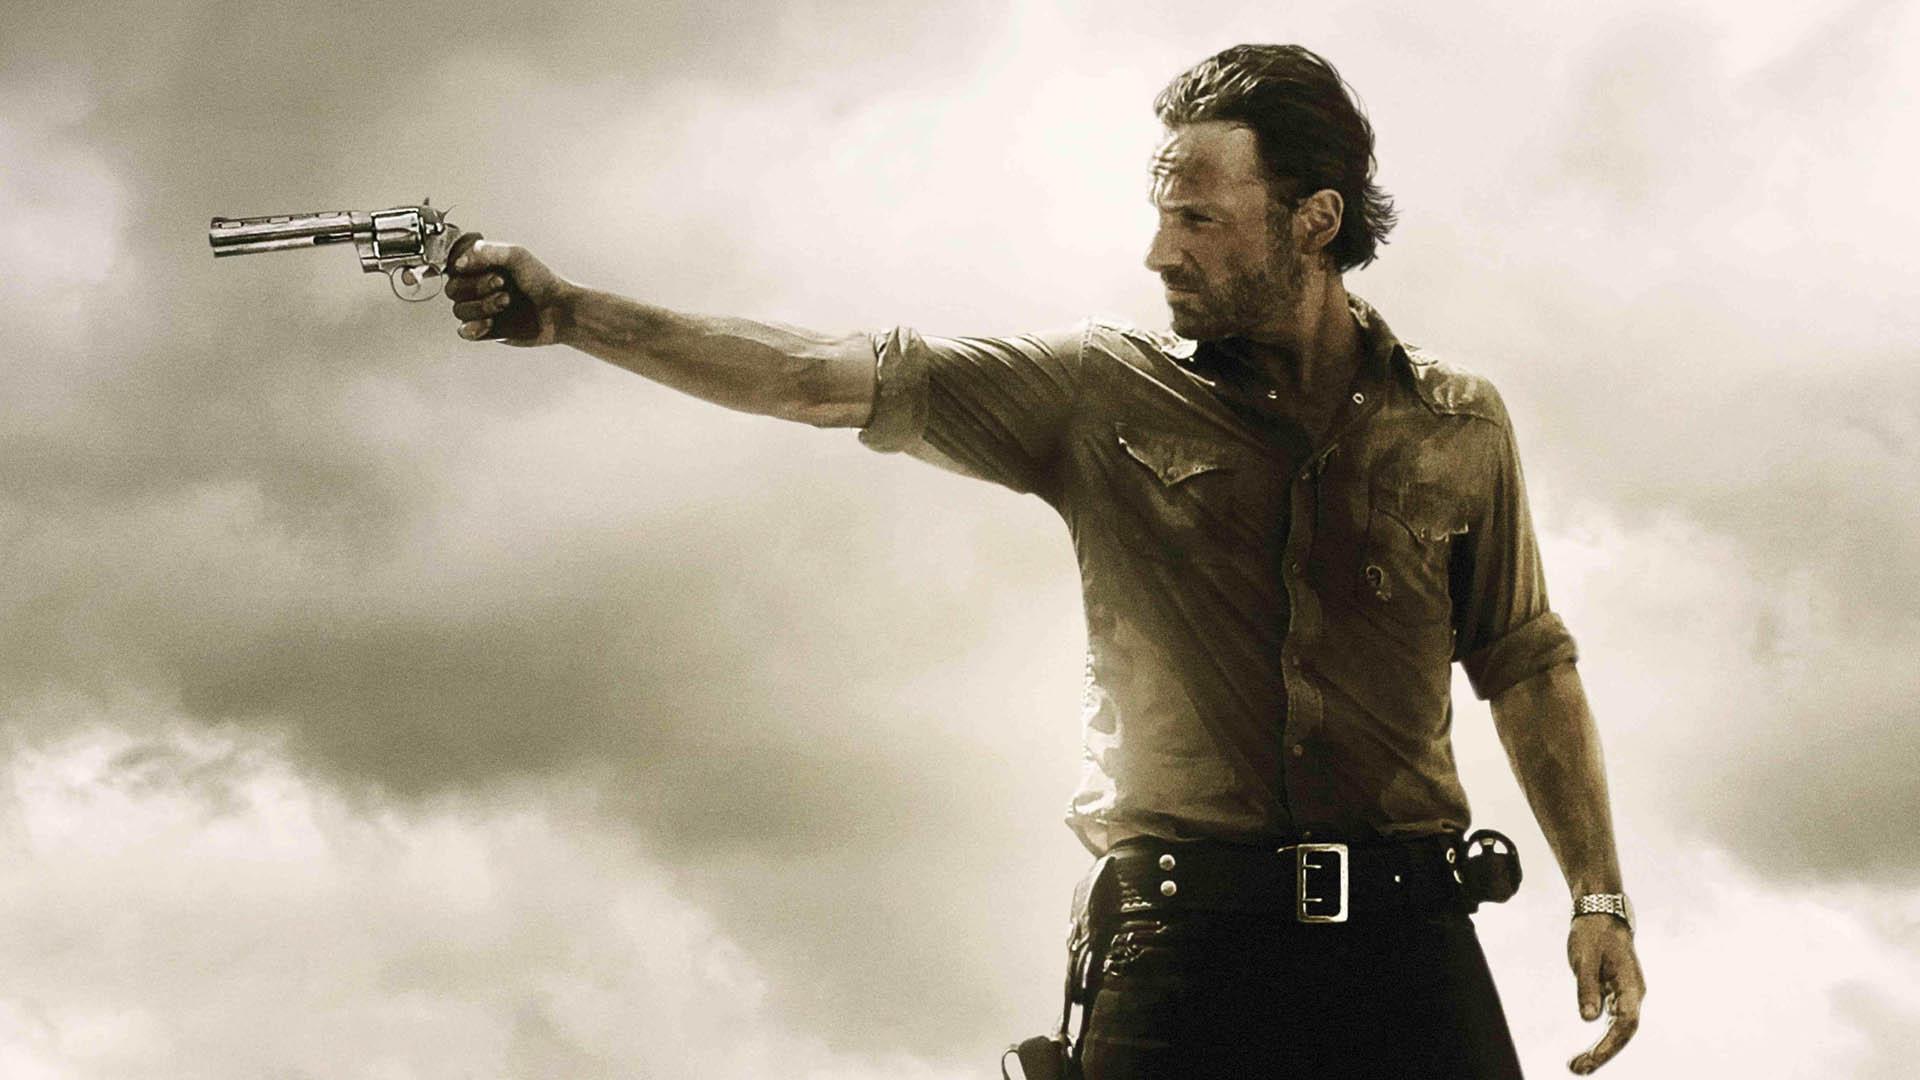 The Walking Dead HD wallpapers free download